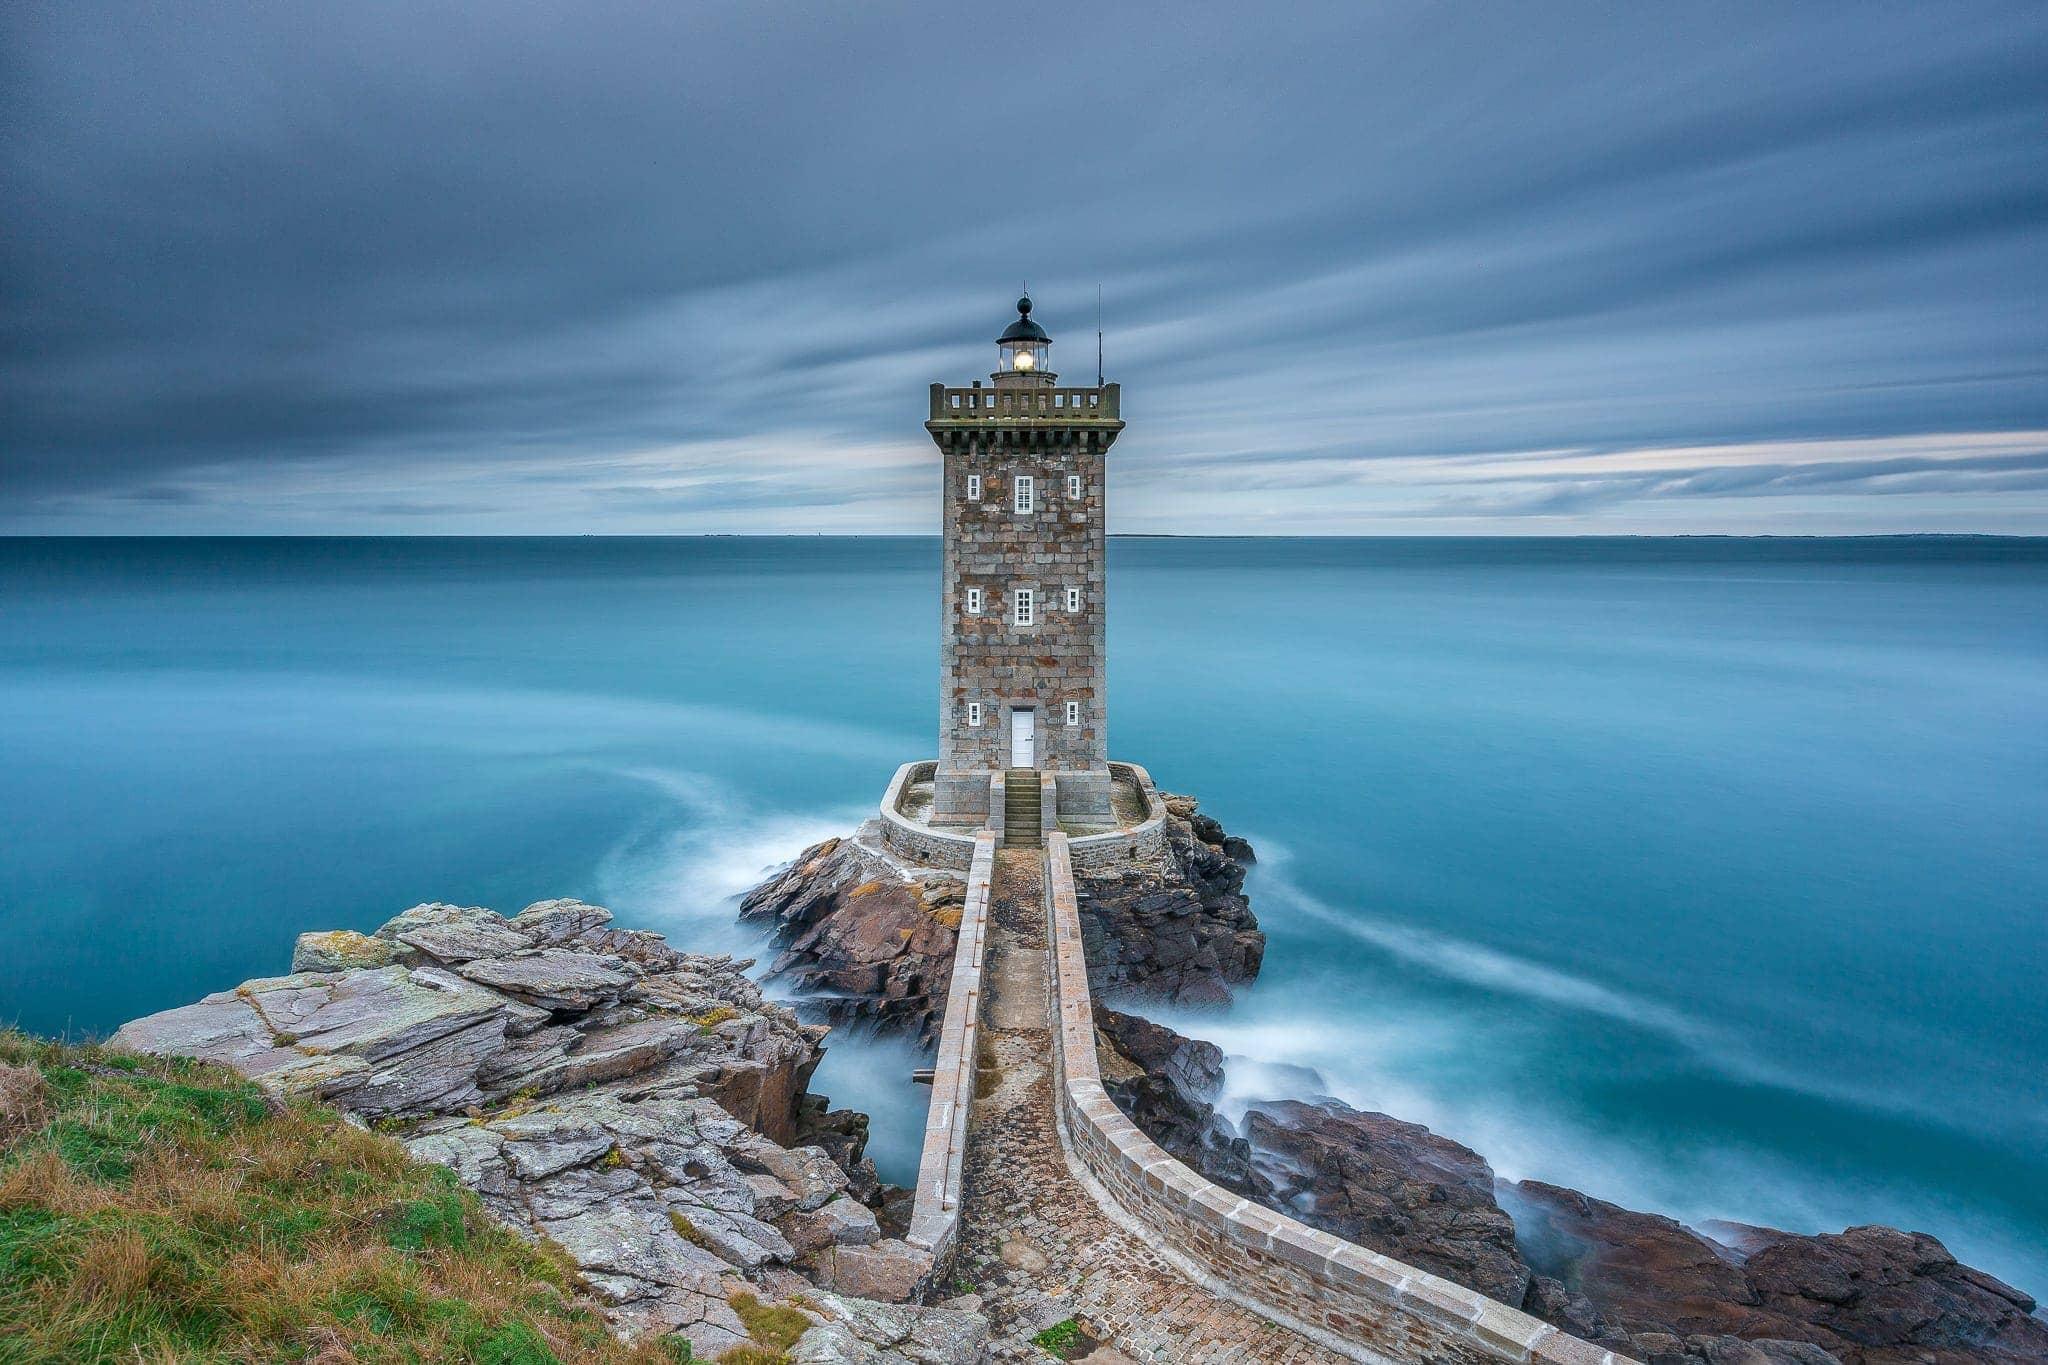 Francesco Gola Seascape Landscape Photography Brittany Bretagne France Lighthouse Kermorvan Polyphemus Long Exposure